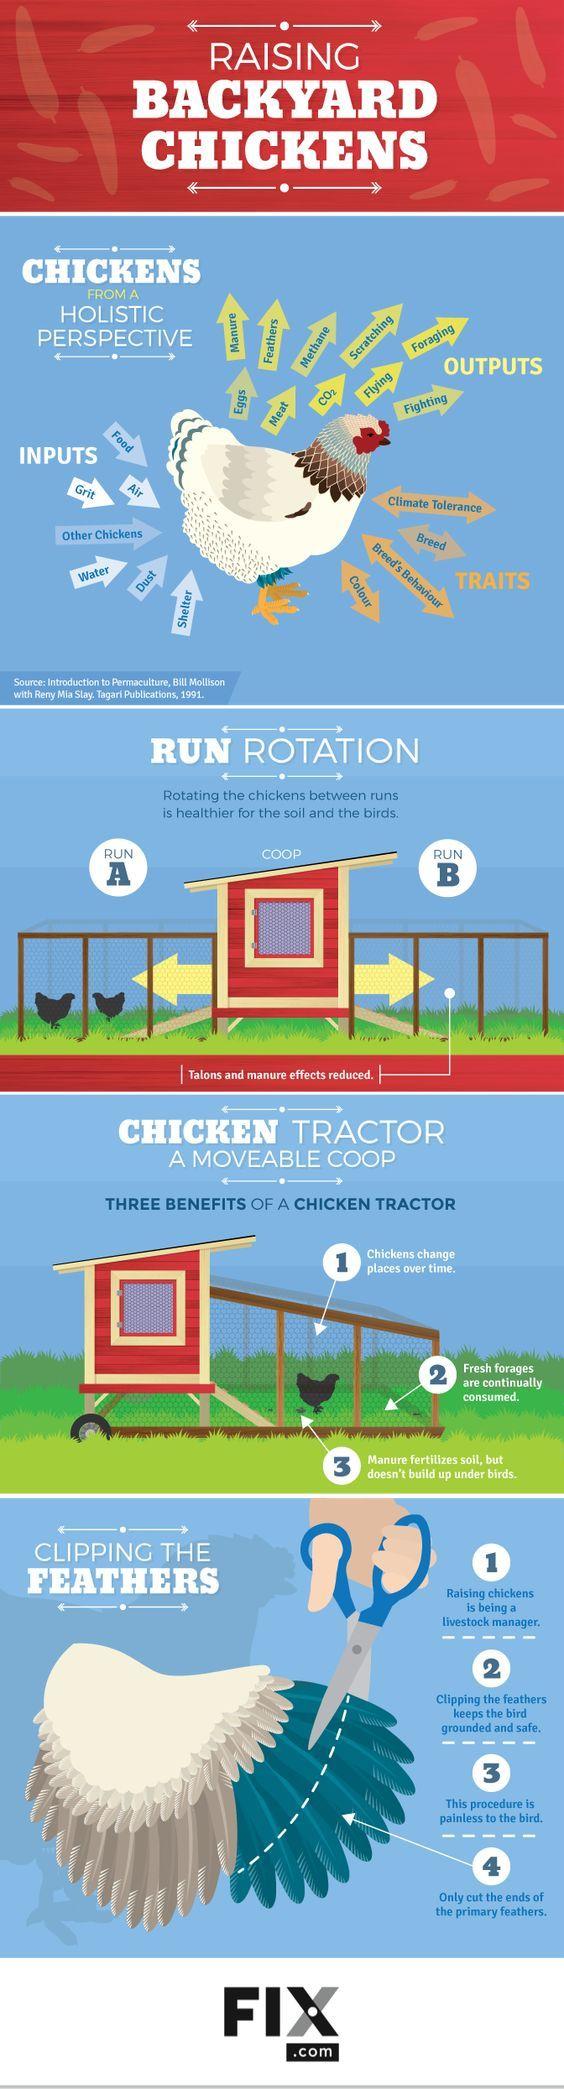 best 25 backyard chickens ideas on pinterest chicken houses